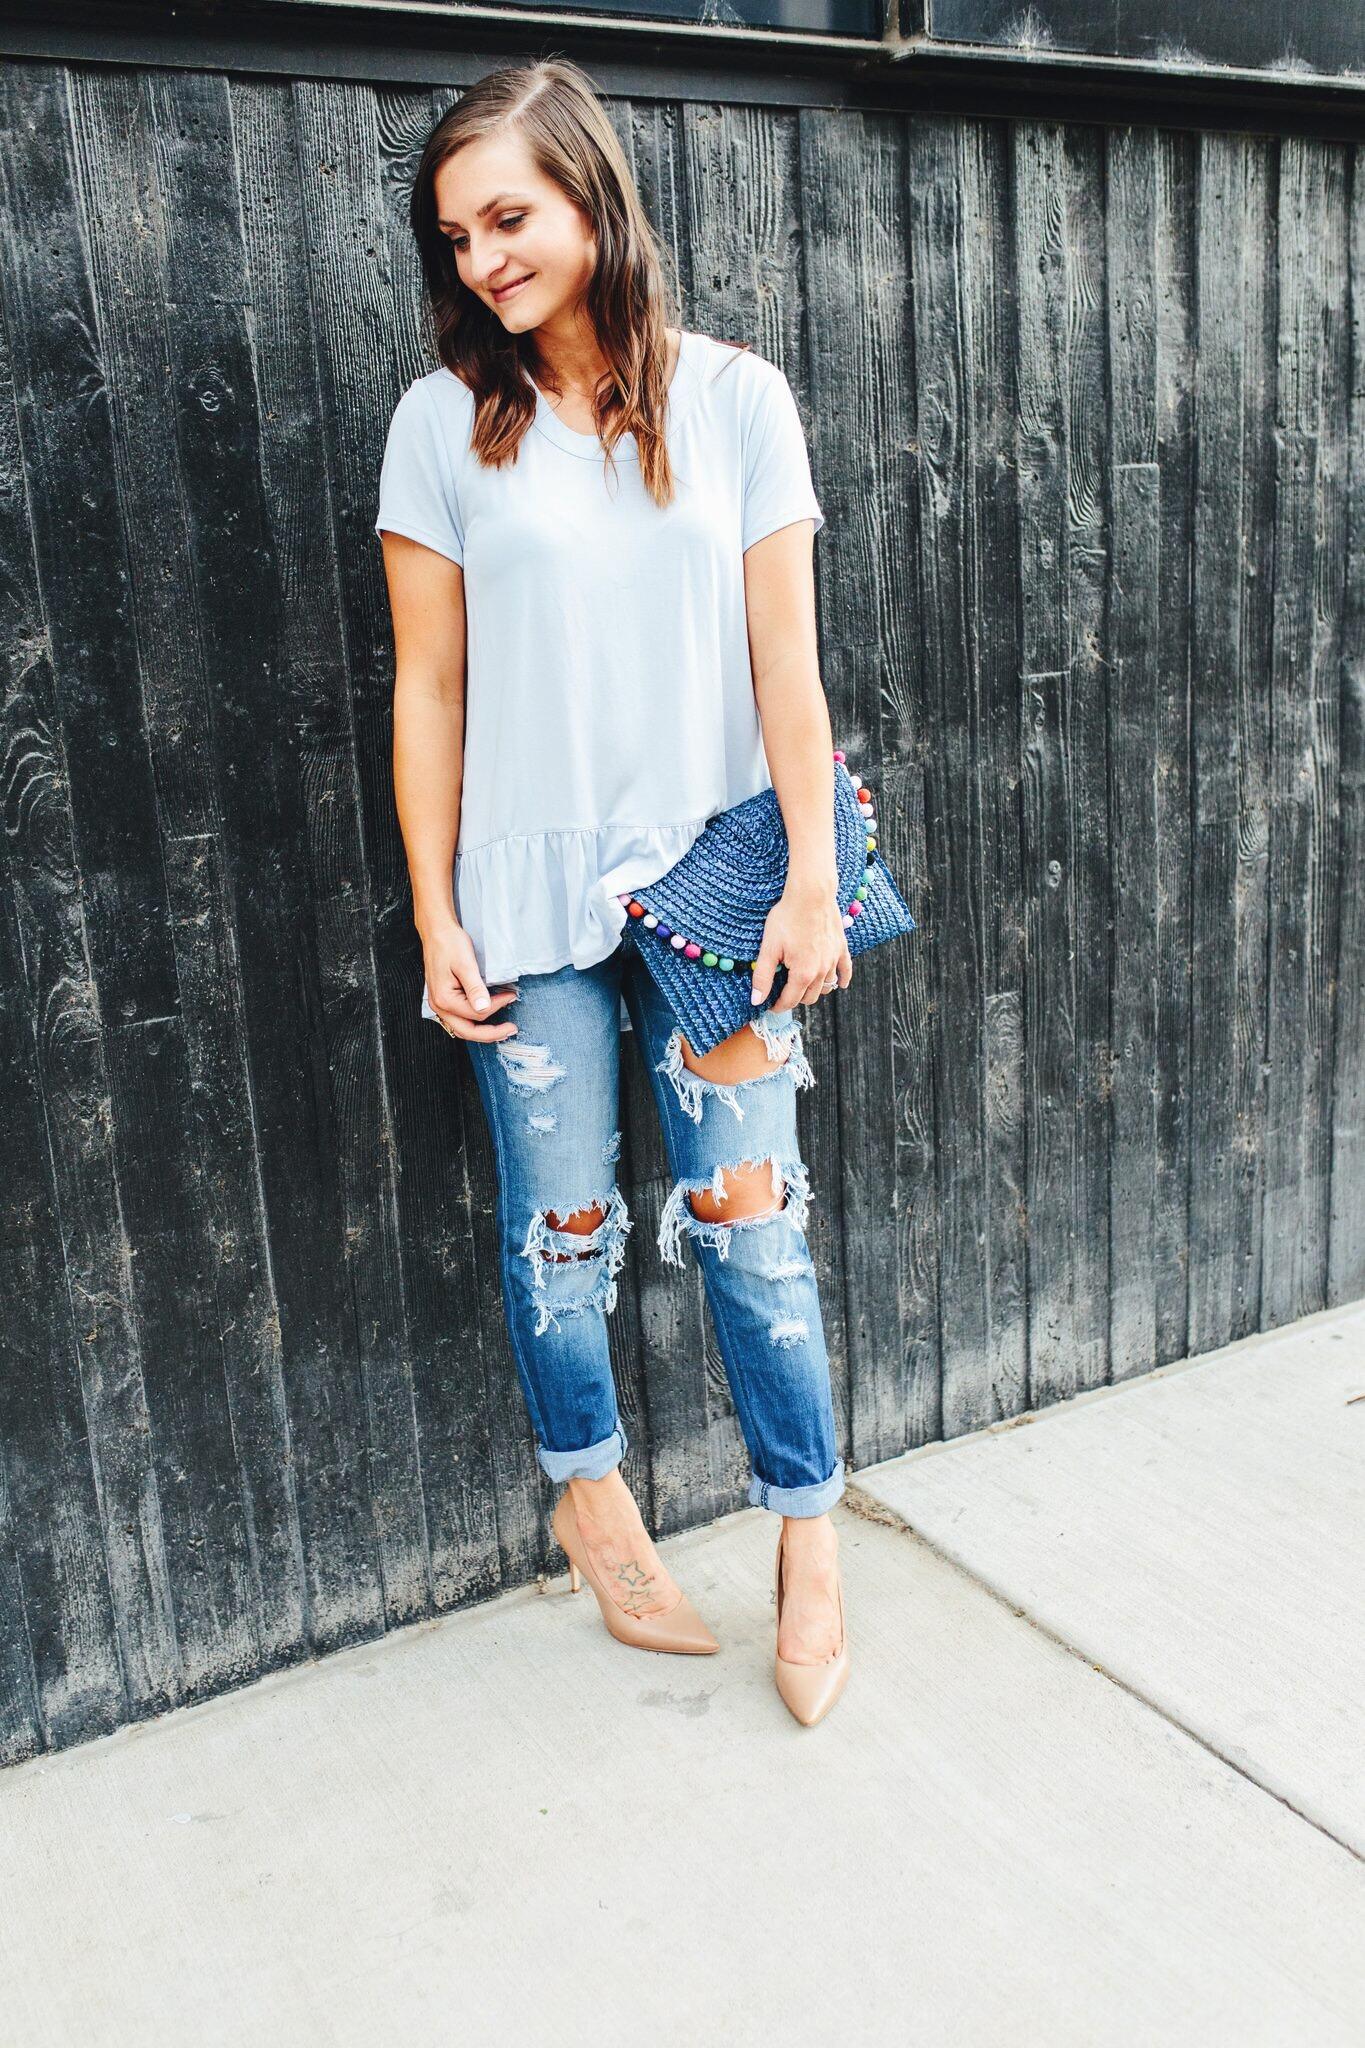 "<img src =""how-to-wear-boyfriend-jeans.jpg"" alt = ""Fashion-blogger-teddybearsandlipstick-showing-how-to-style-boyfriend-jeans-with-classic-sam-edeman-hazel-pumps-a-colorful-pompom-clutch-and-blue-peplum-top"">"